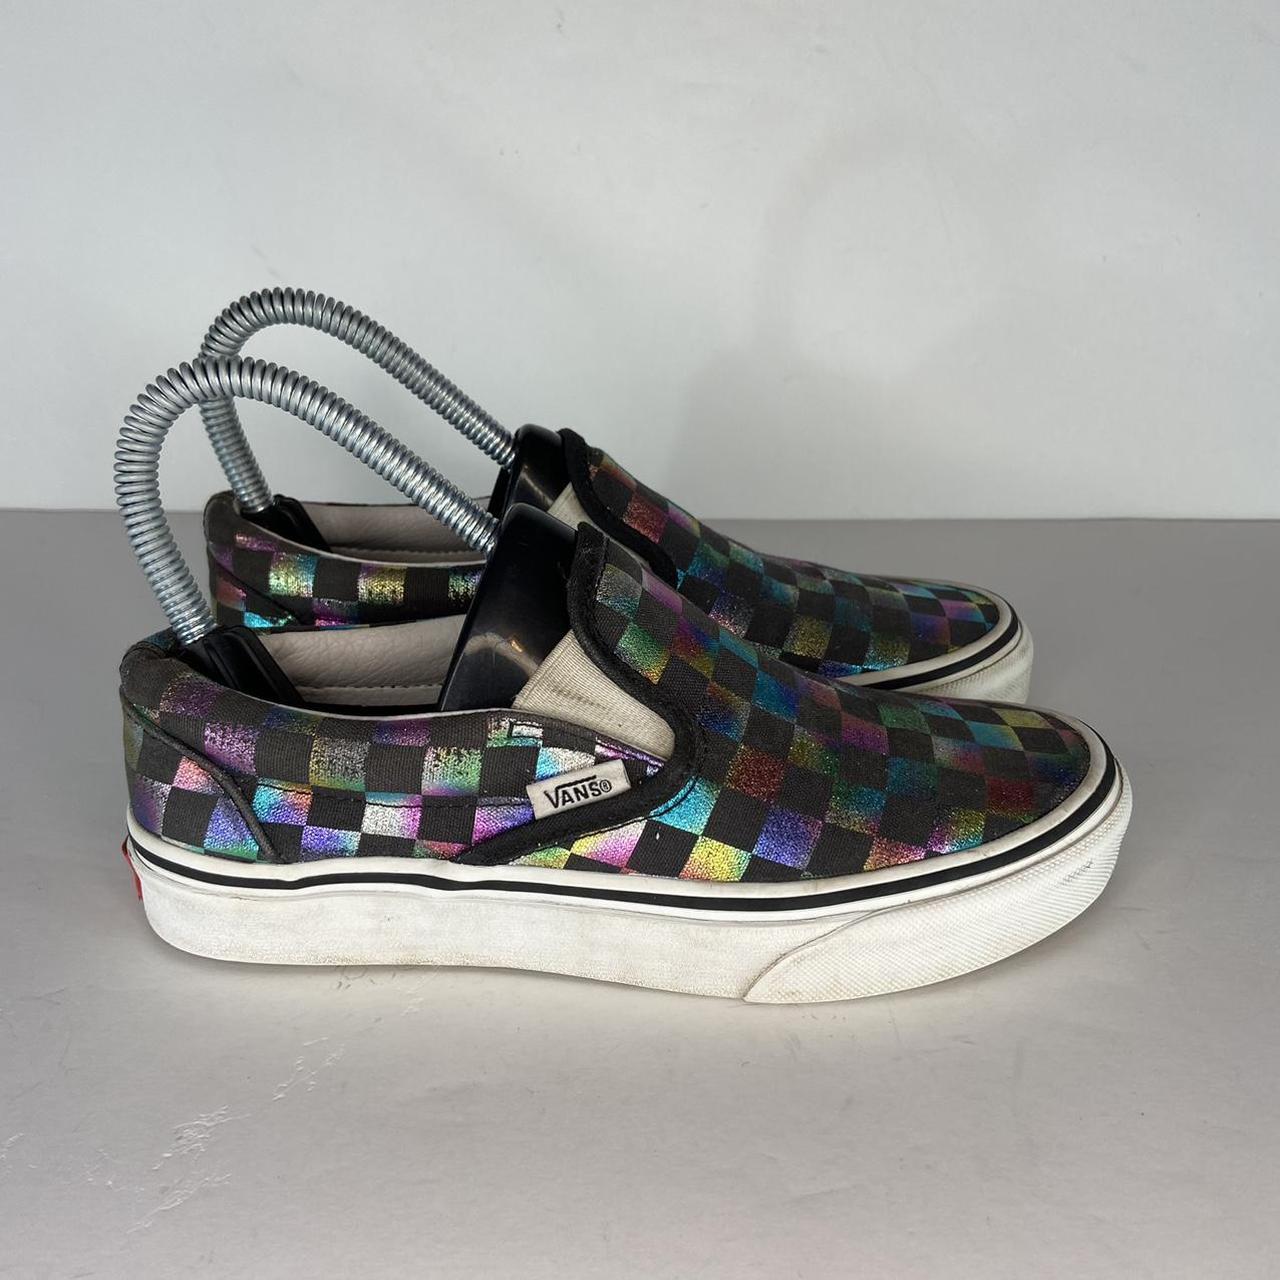 Product Image 1 - Vans slip on sneakers. Women's